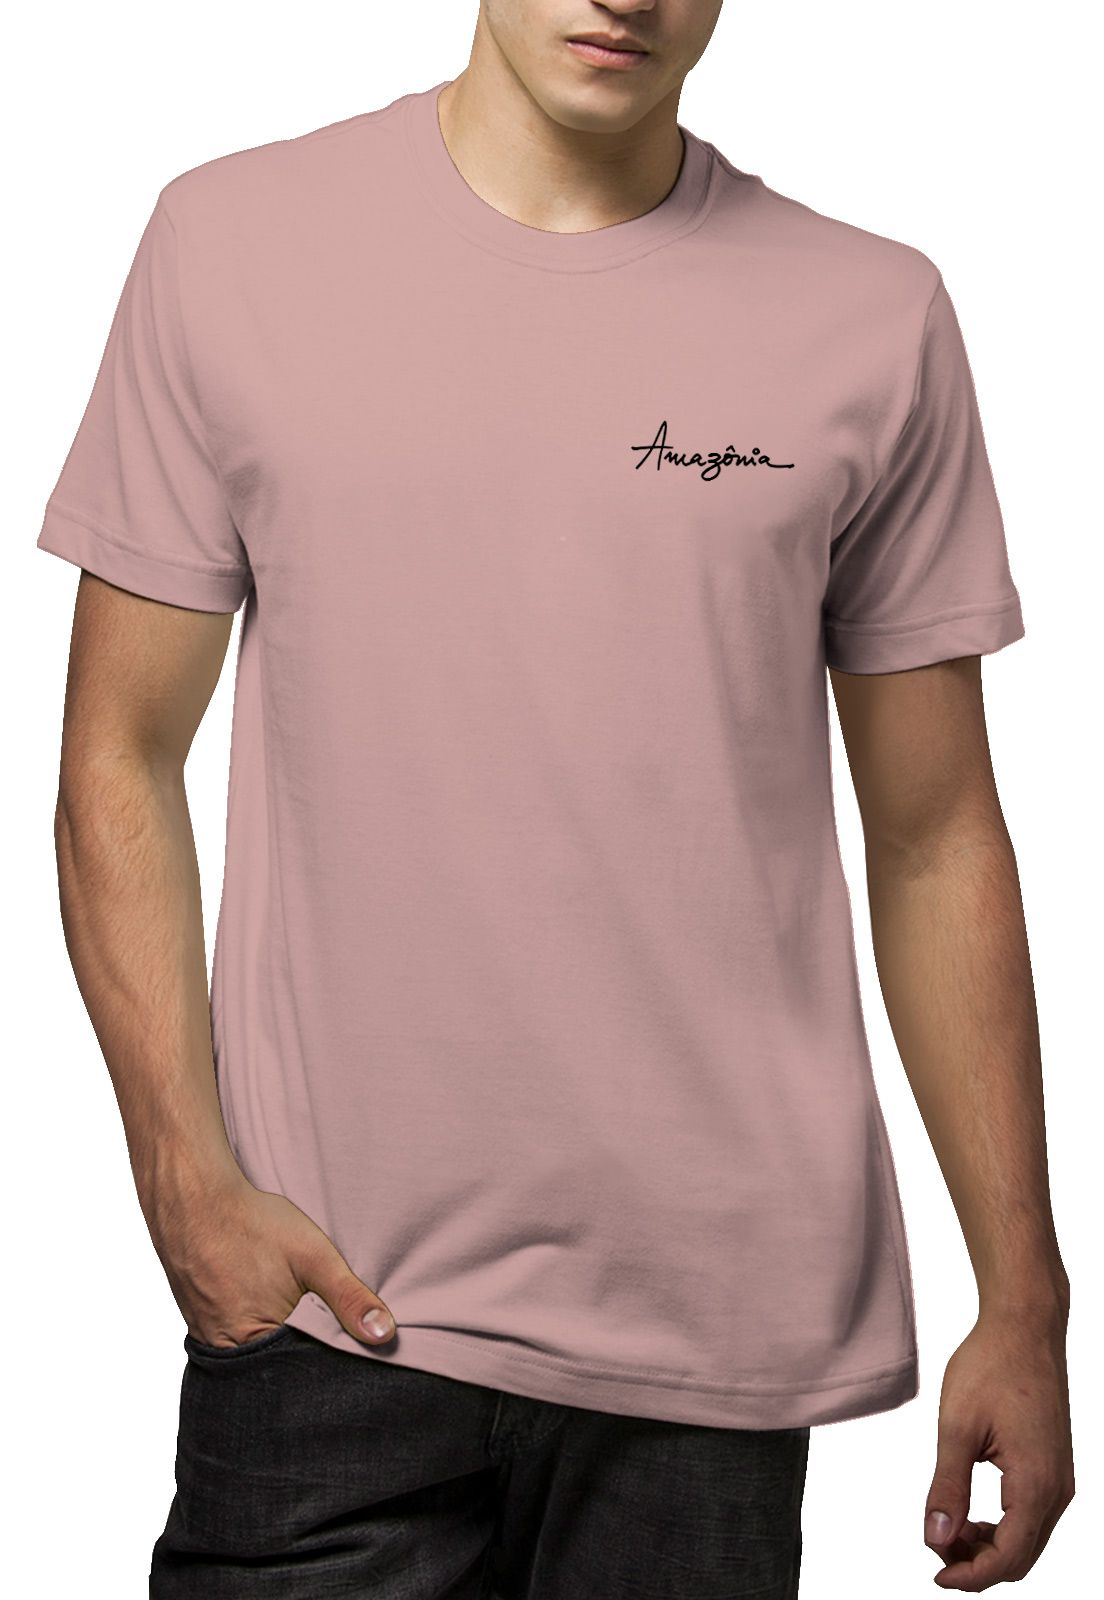 Camiseta Amazônia Arara Brasileira - Rosa Claro